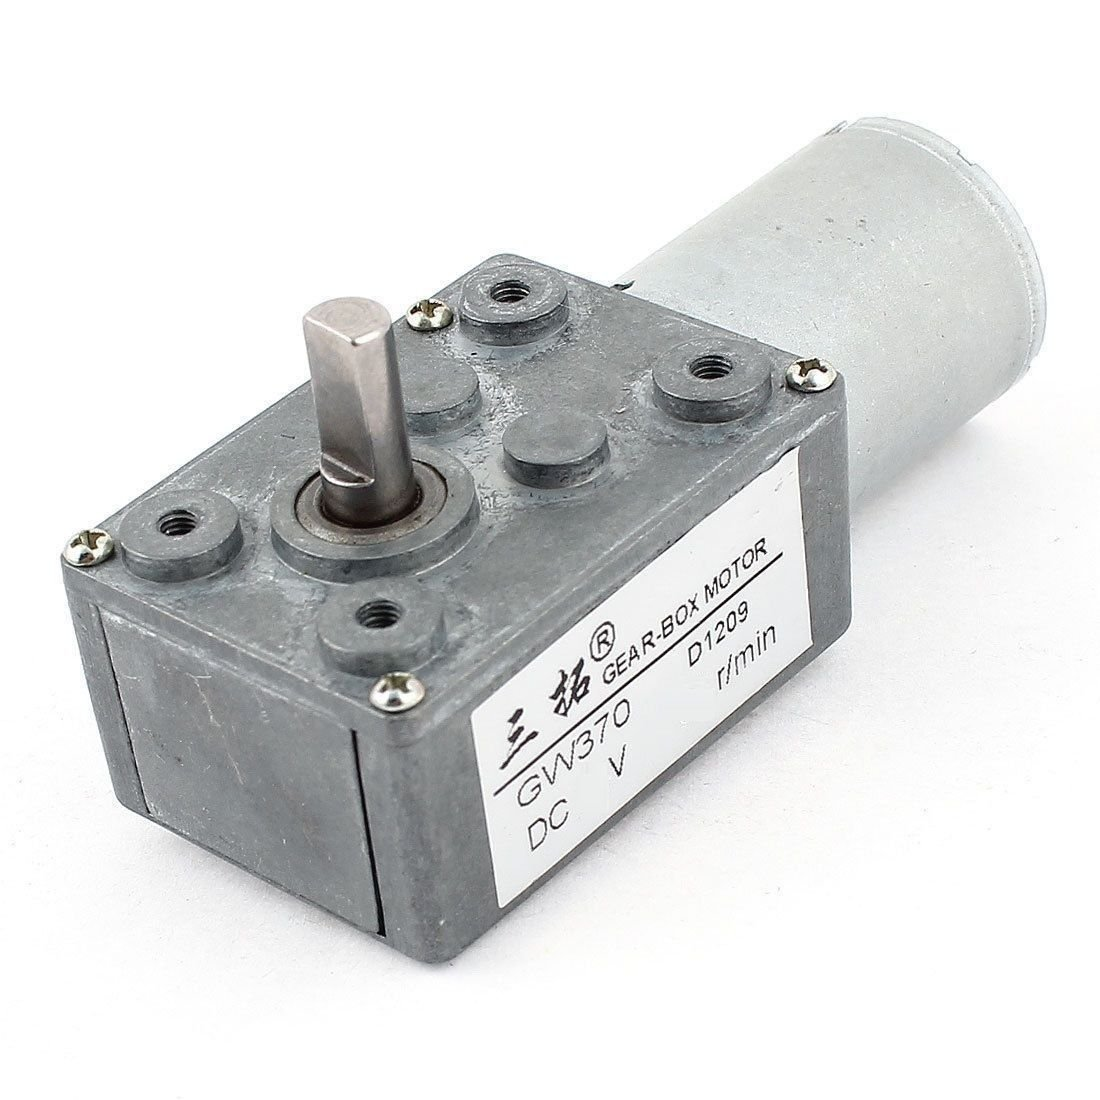 12V 5RPM 11kg.cm 0.3A Low Speed High-torque Reducer Gearbox DC Worm Gear Motor